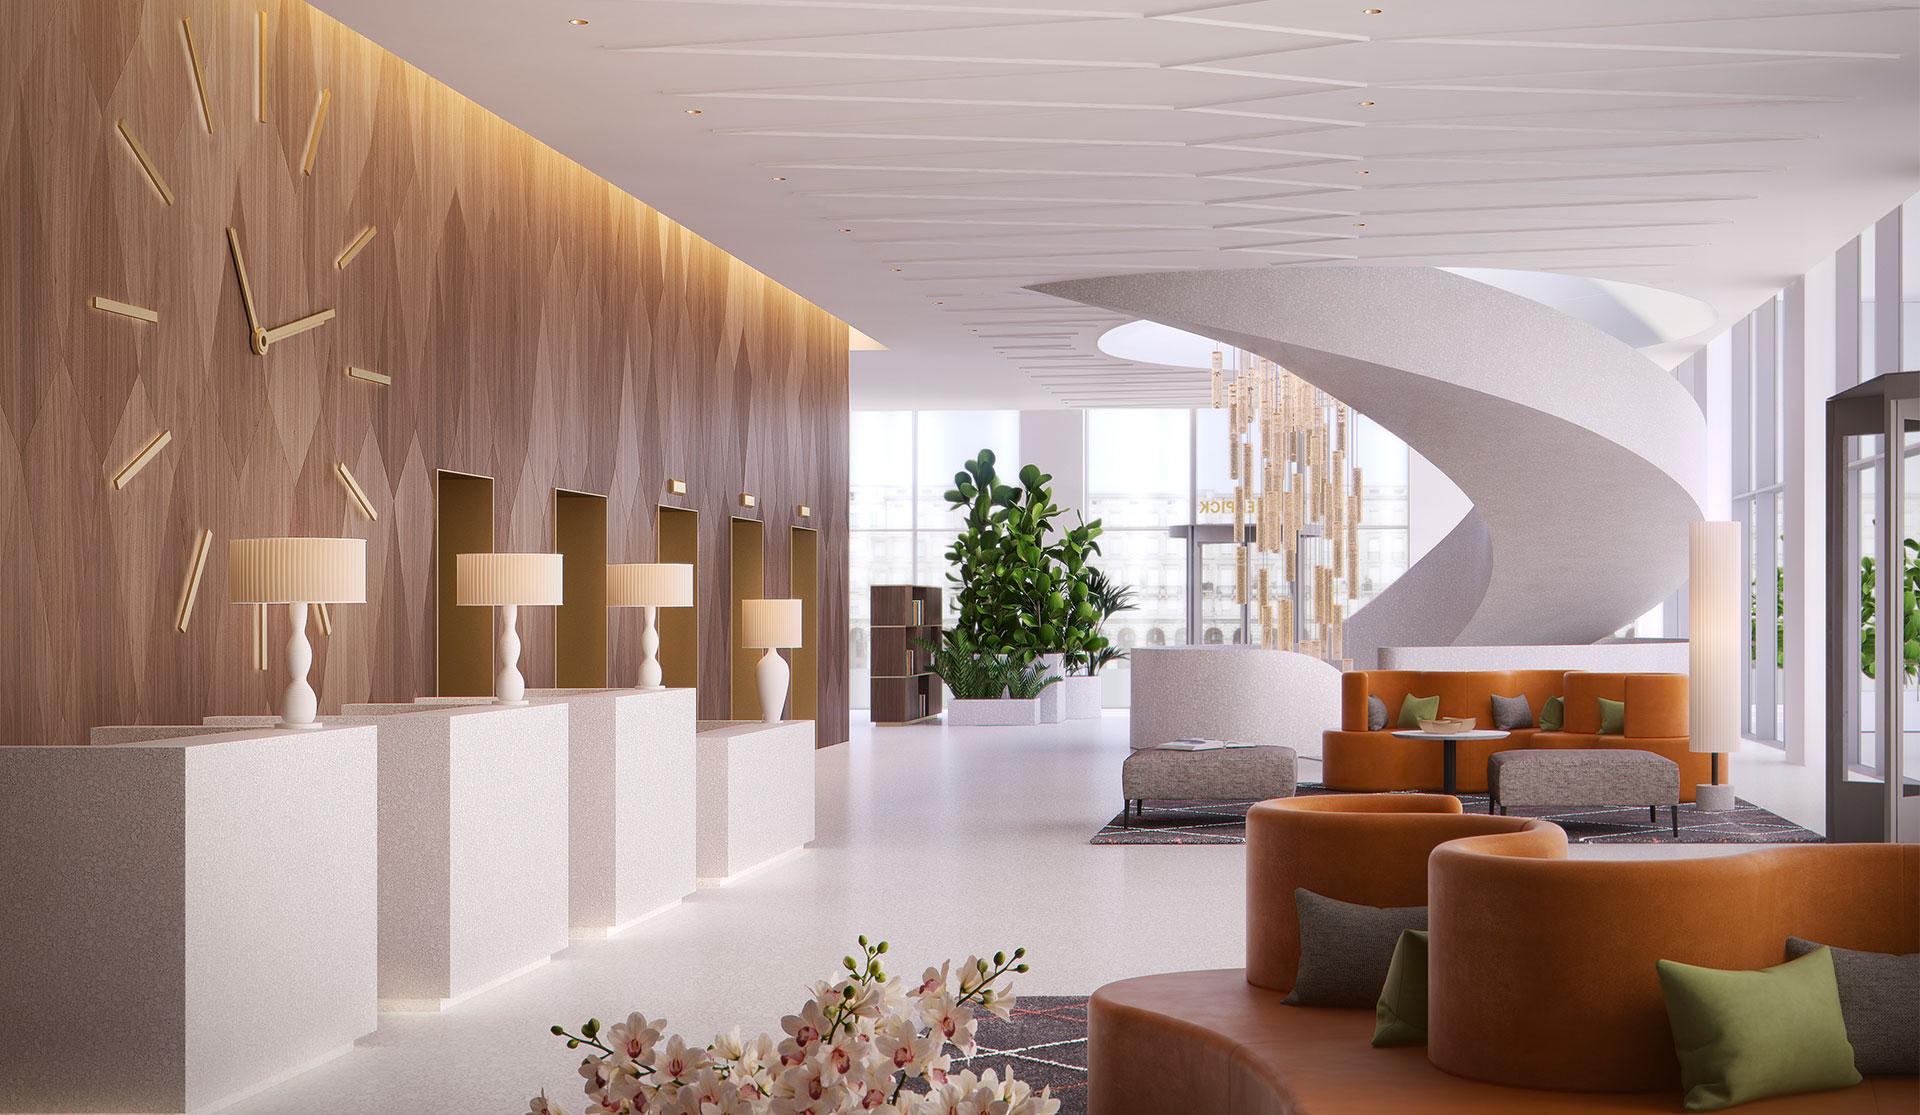 City Hotel   Matteo Thun & Partners